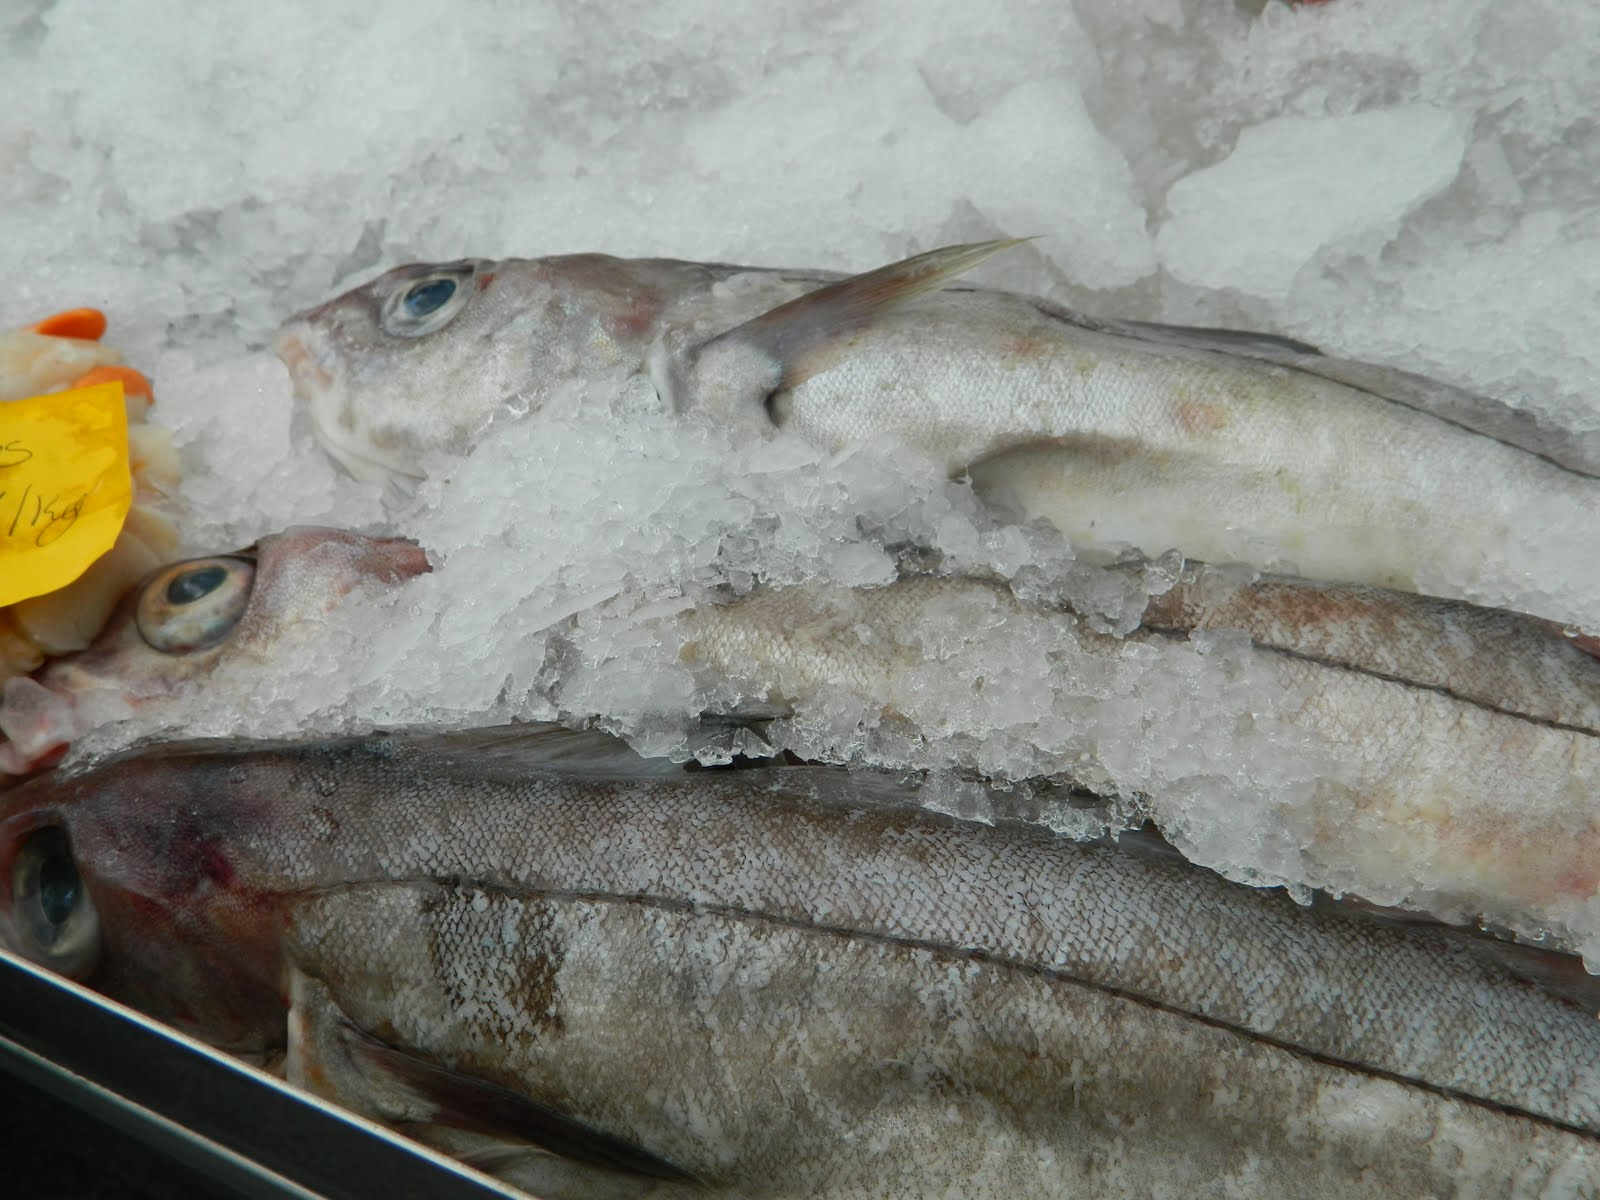 Lemon love notes spiddal market connemara ireland for Saving fish from drowning